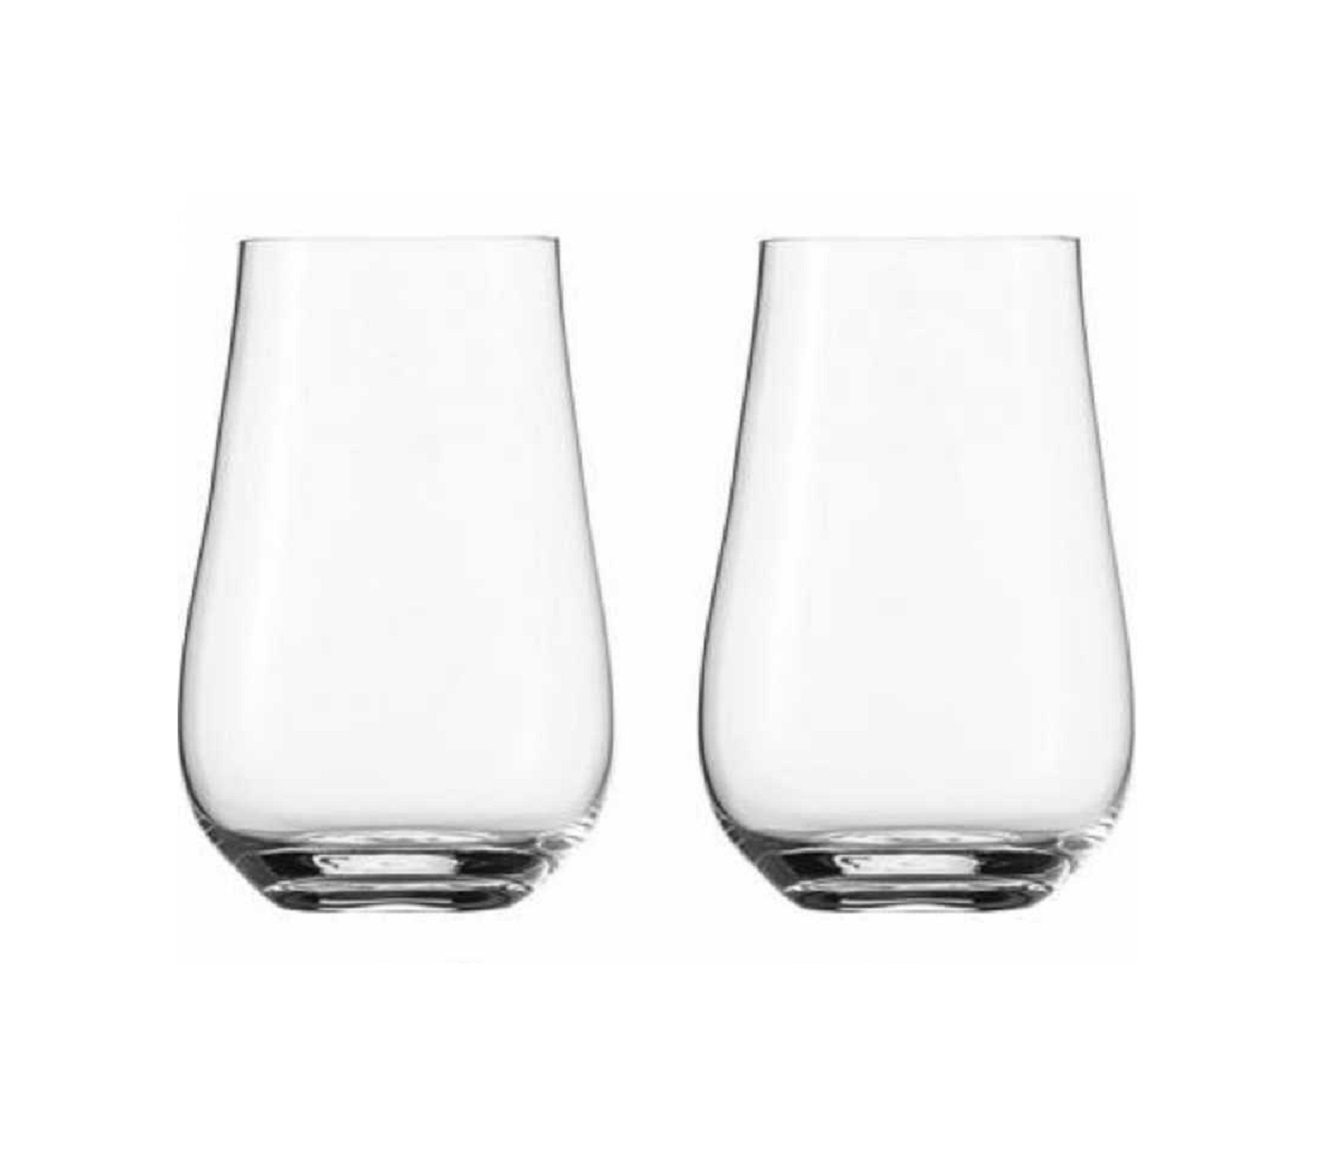 Набор стаканов Schott Zwiesel Smoothie, объем 0,54 л, прозрачный, 2 штуки Schott Zwiesel 119776 фото 0